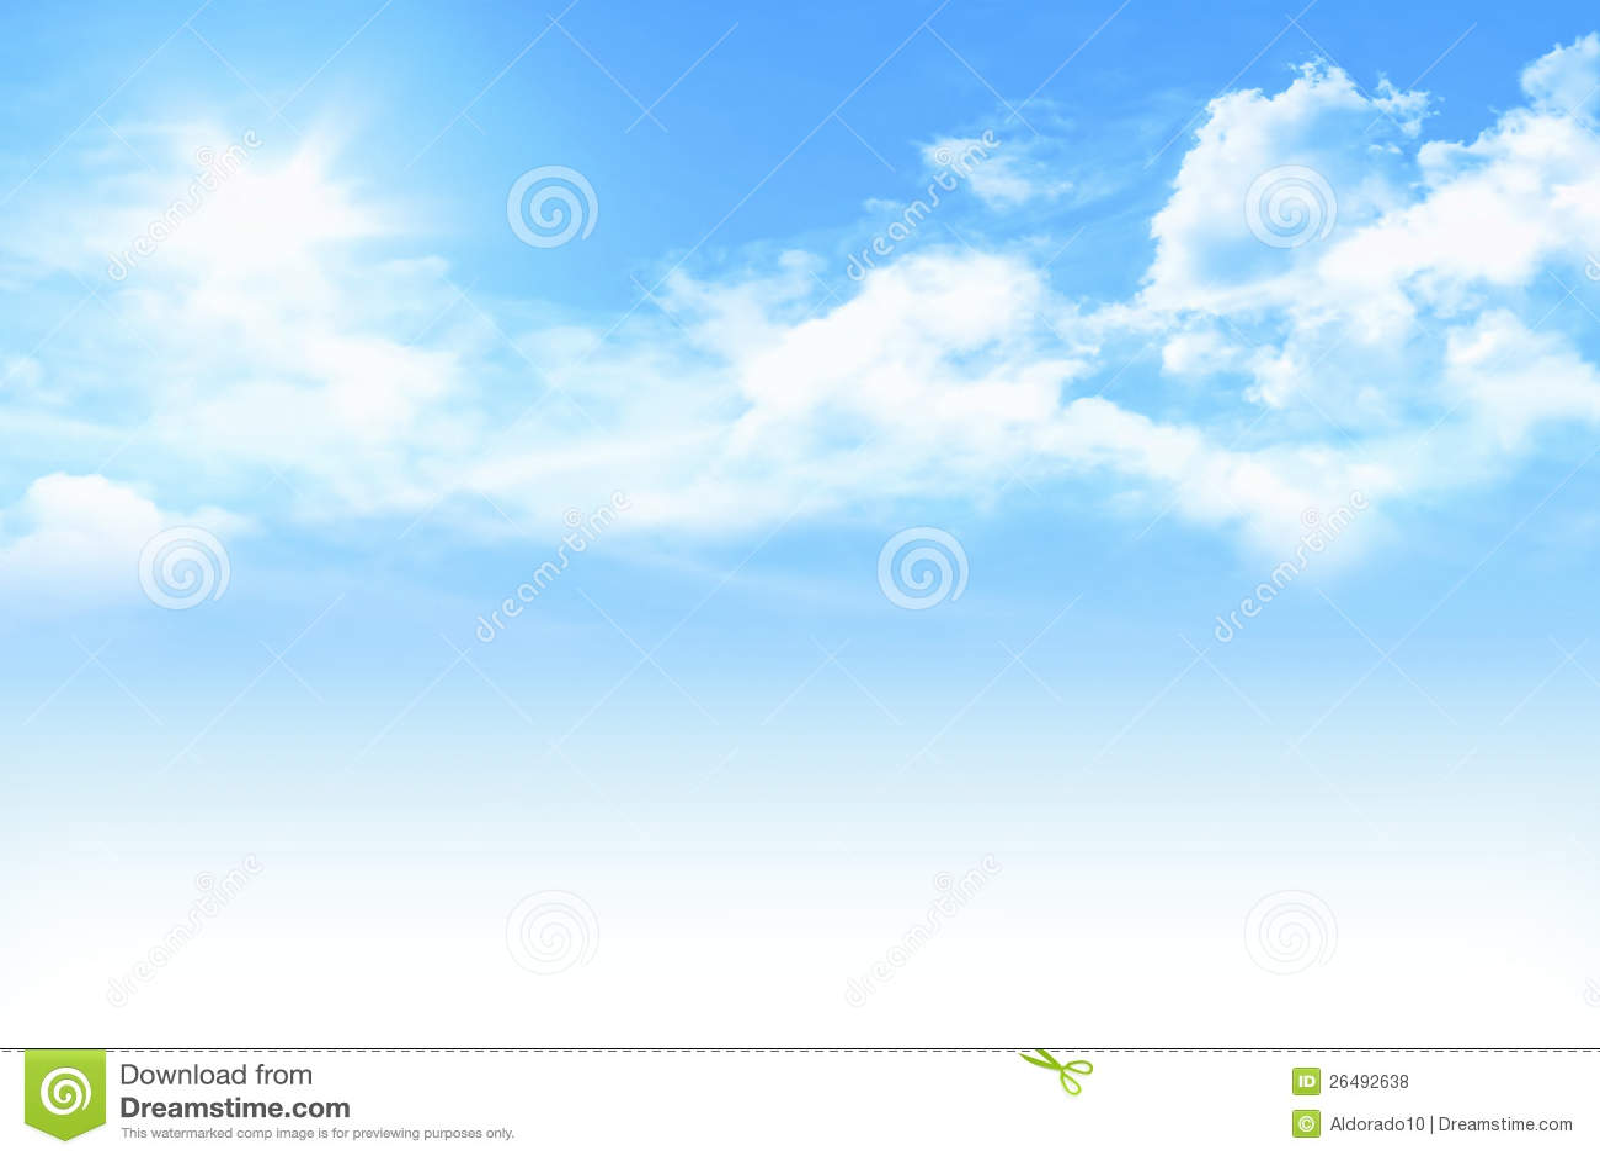 Light Blue Sky Royalty Free Stock Photos - Image: 26492638